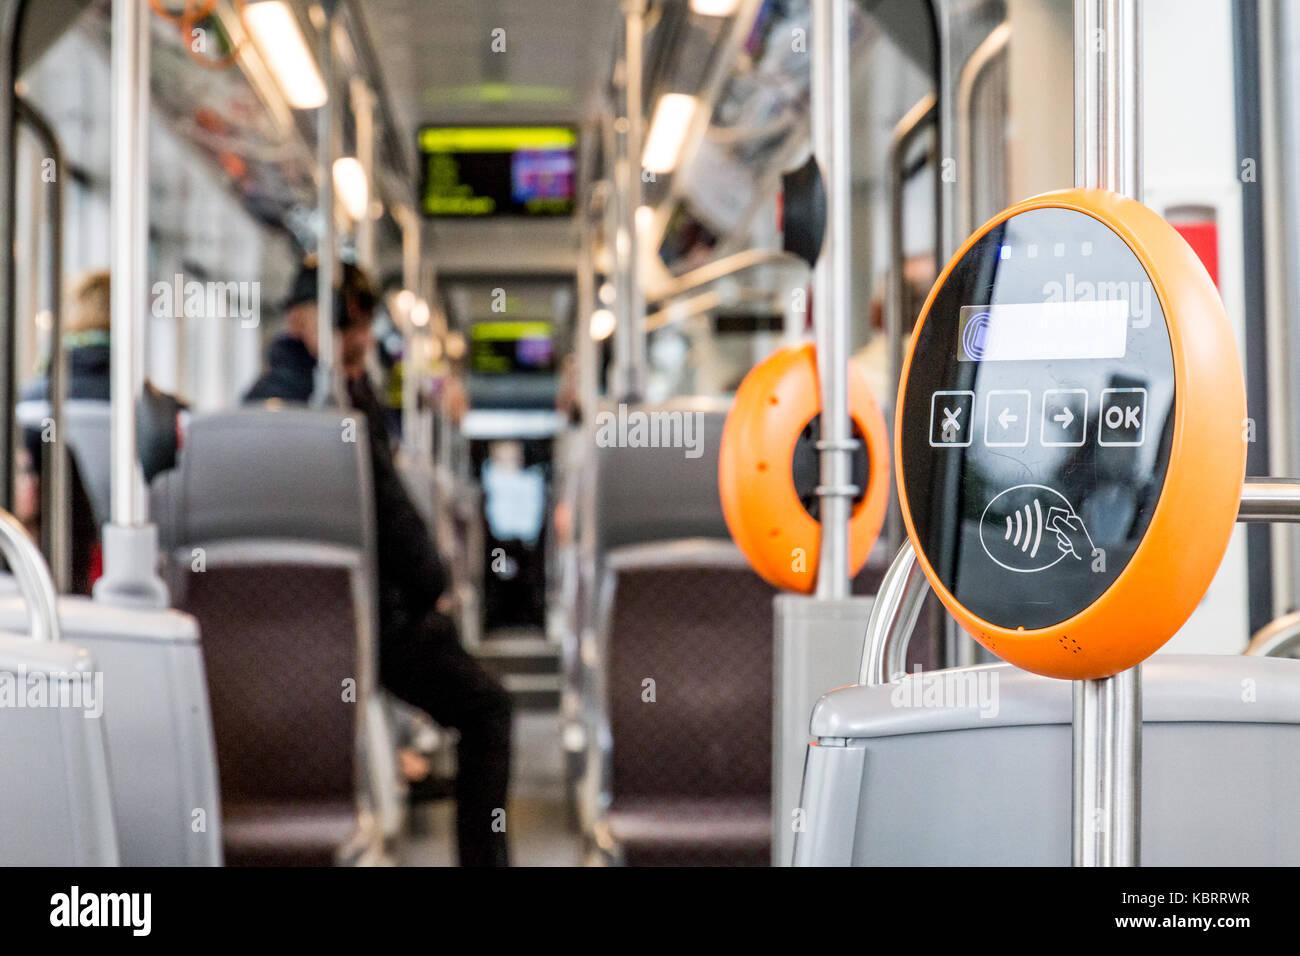 Orange modern magnetic ticket validator - Stock Image